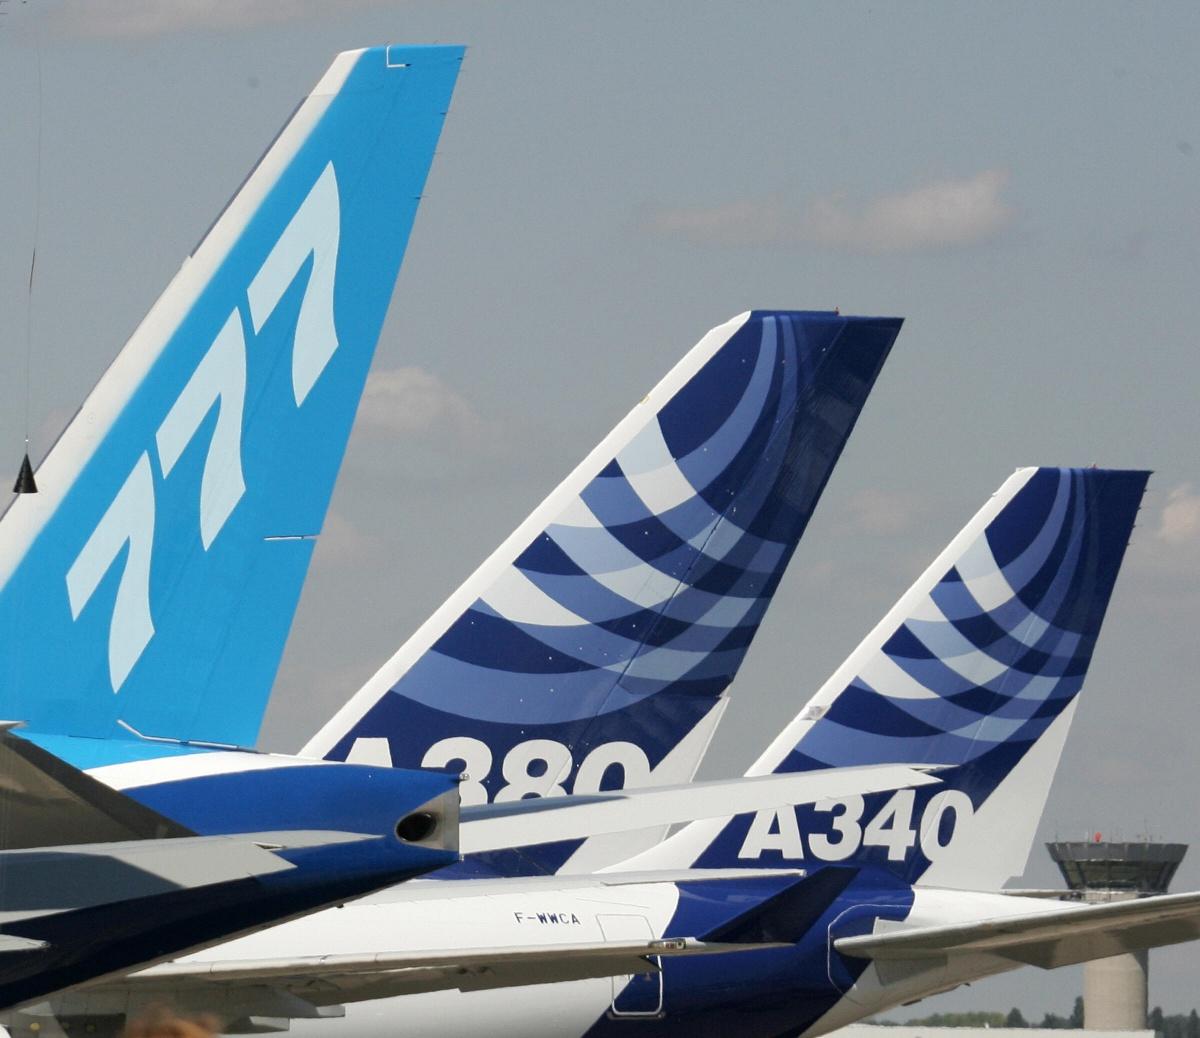 A tail of the 777, A380 and A340 at the Paris Air Show in 2005. Photo: Getty